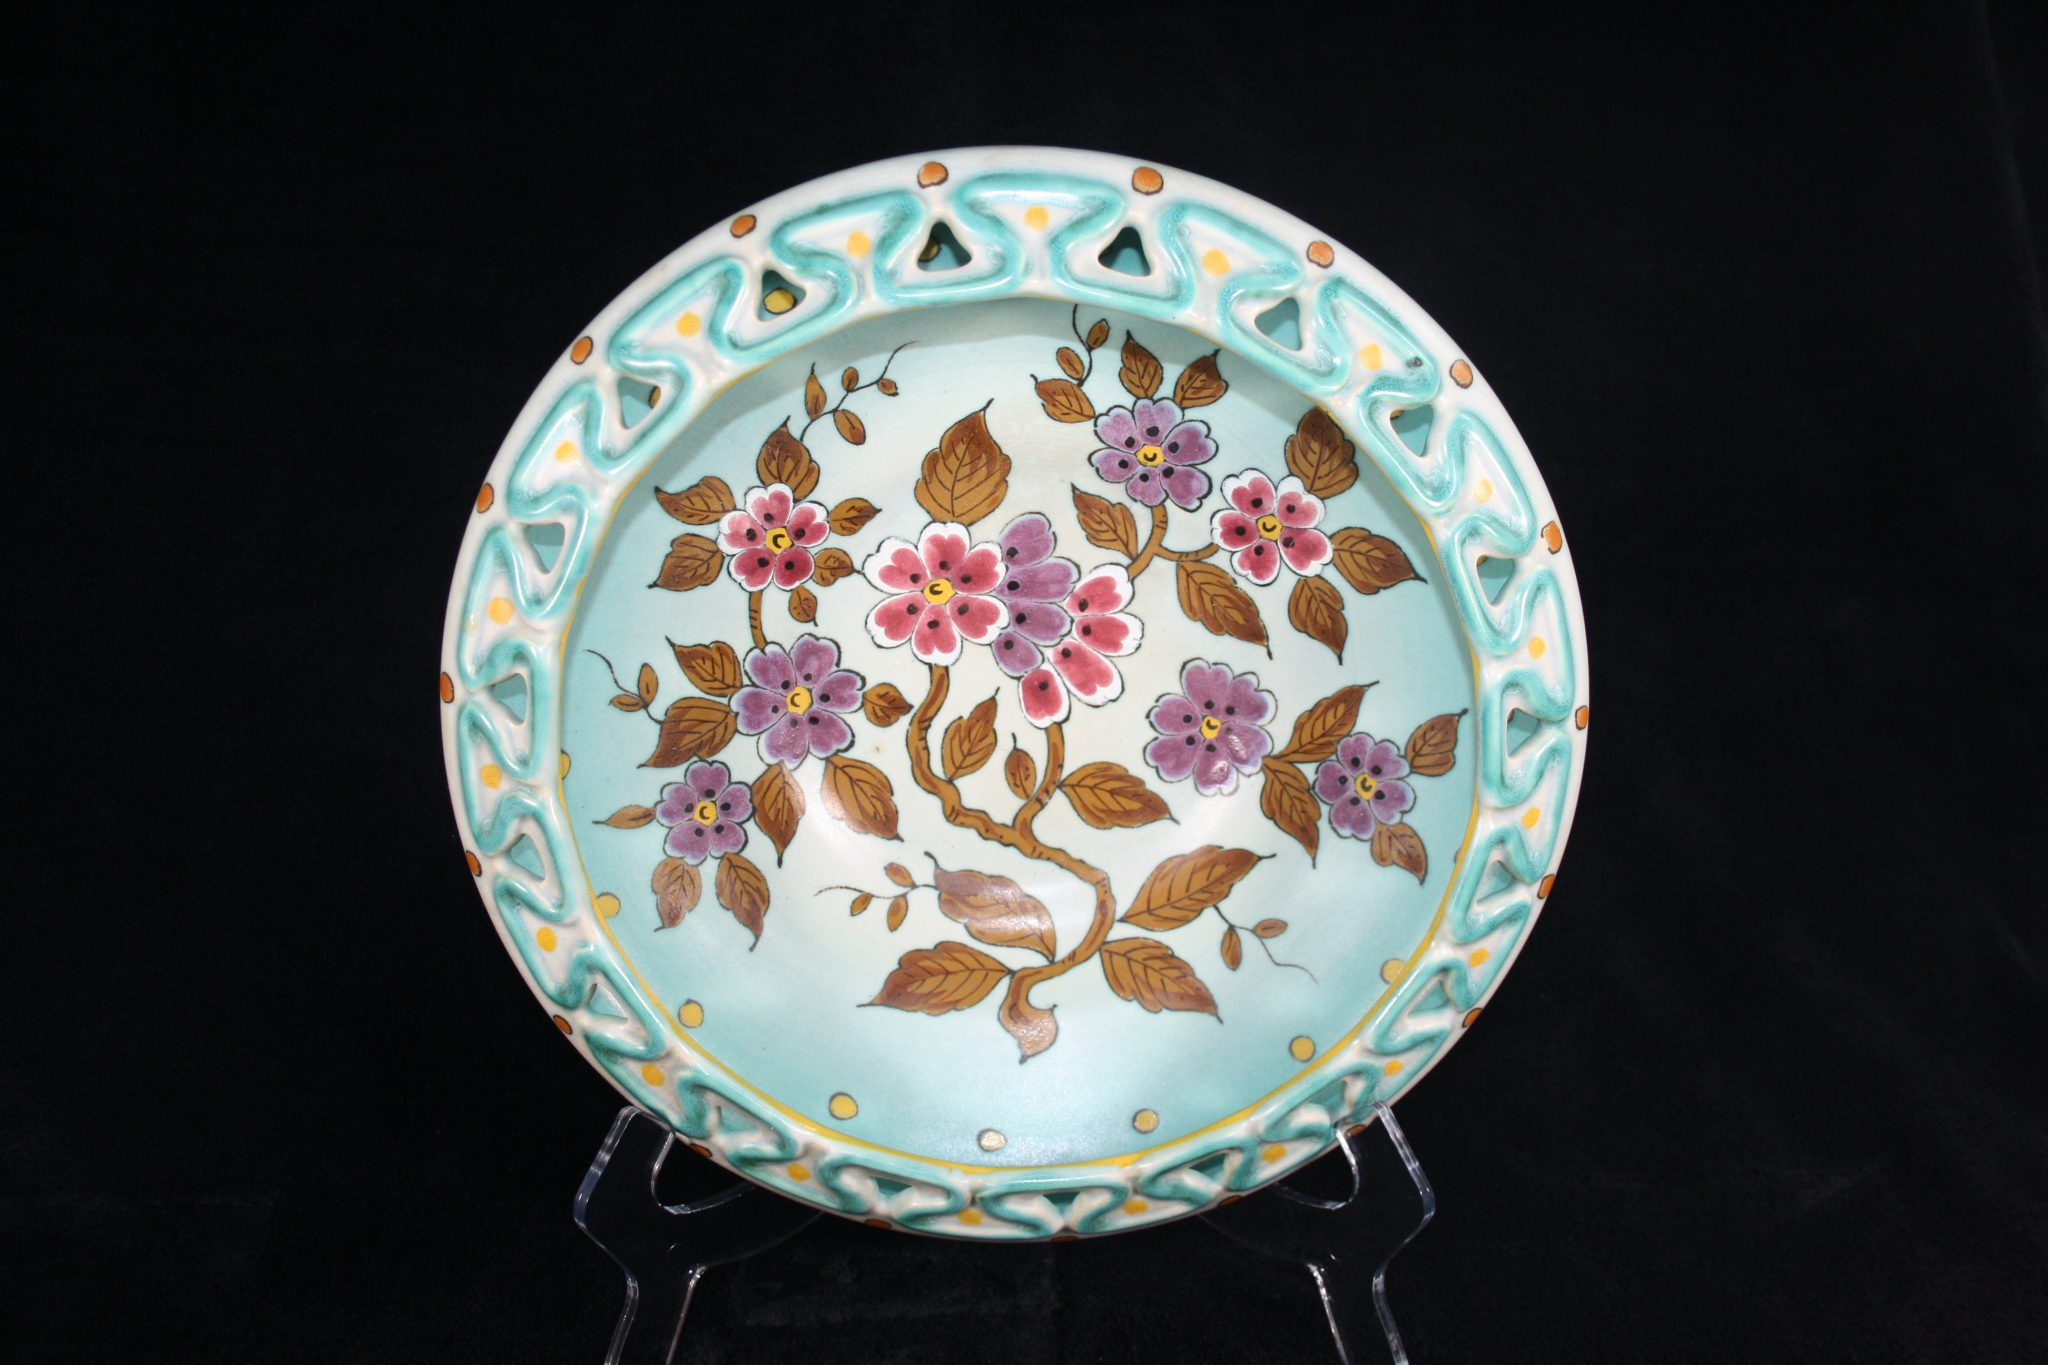 Verwonderend E06002 - Dutch art pottery (plateel) vintage large dish or float TV-15